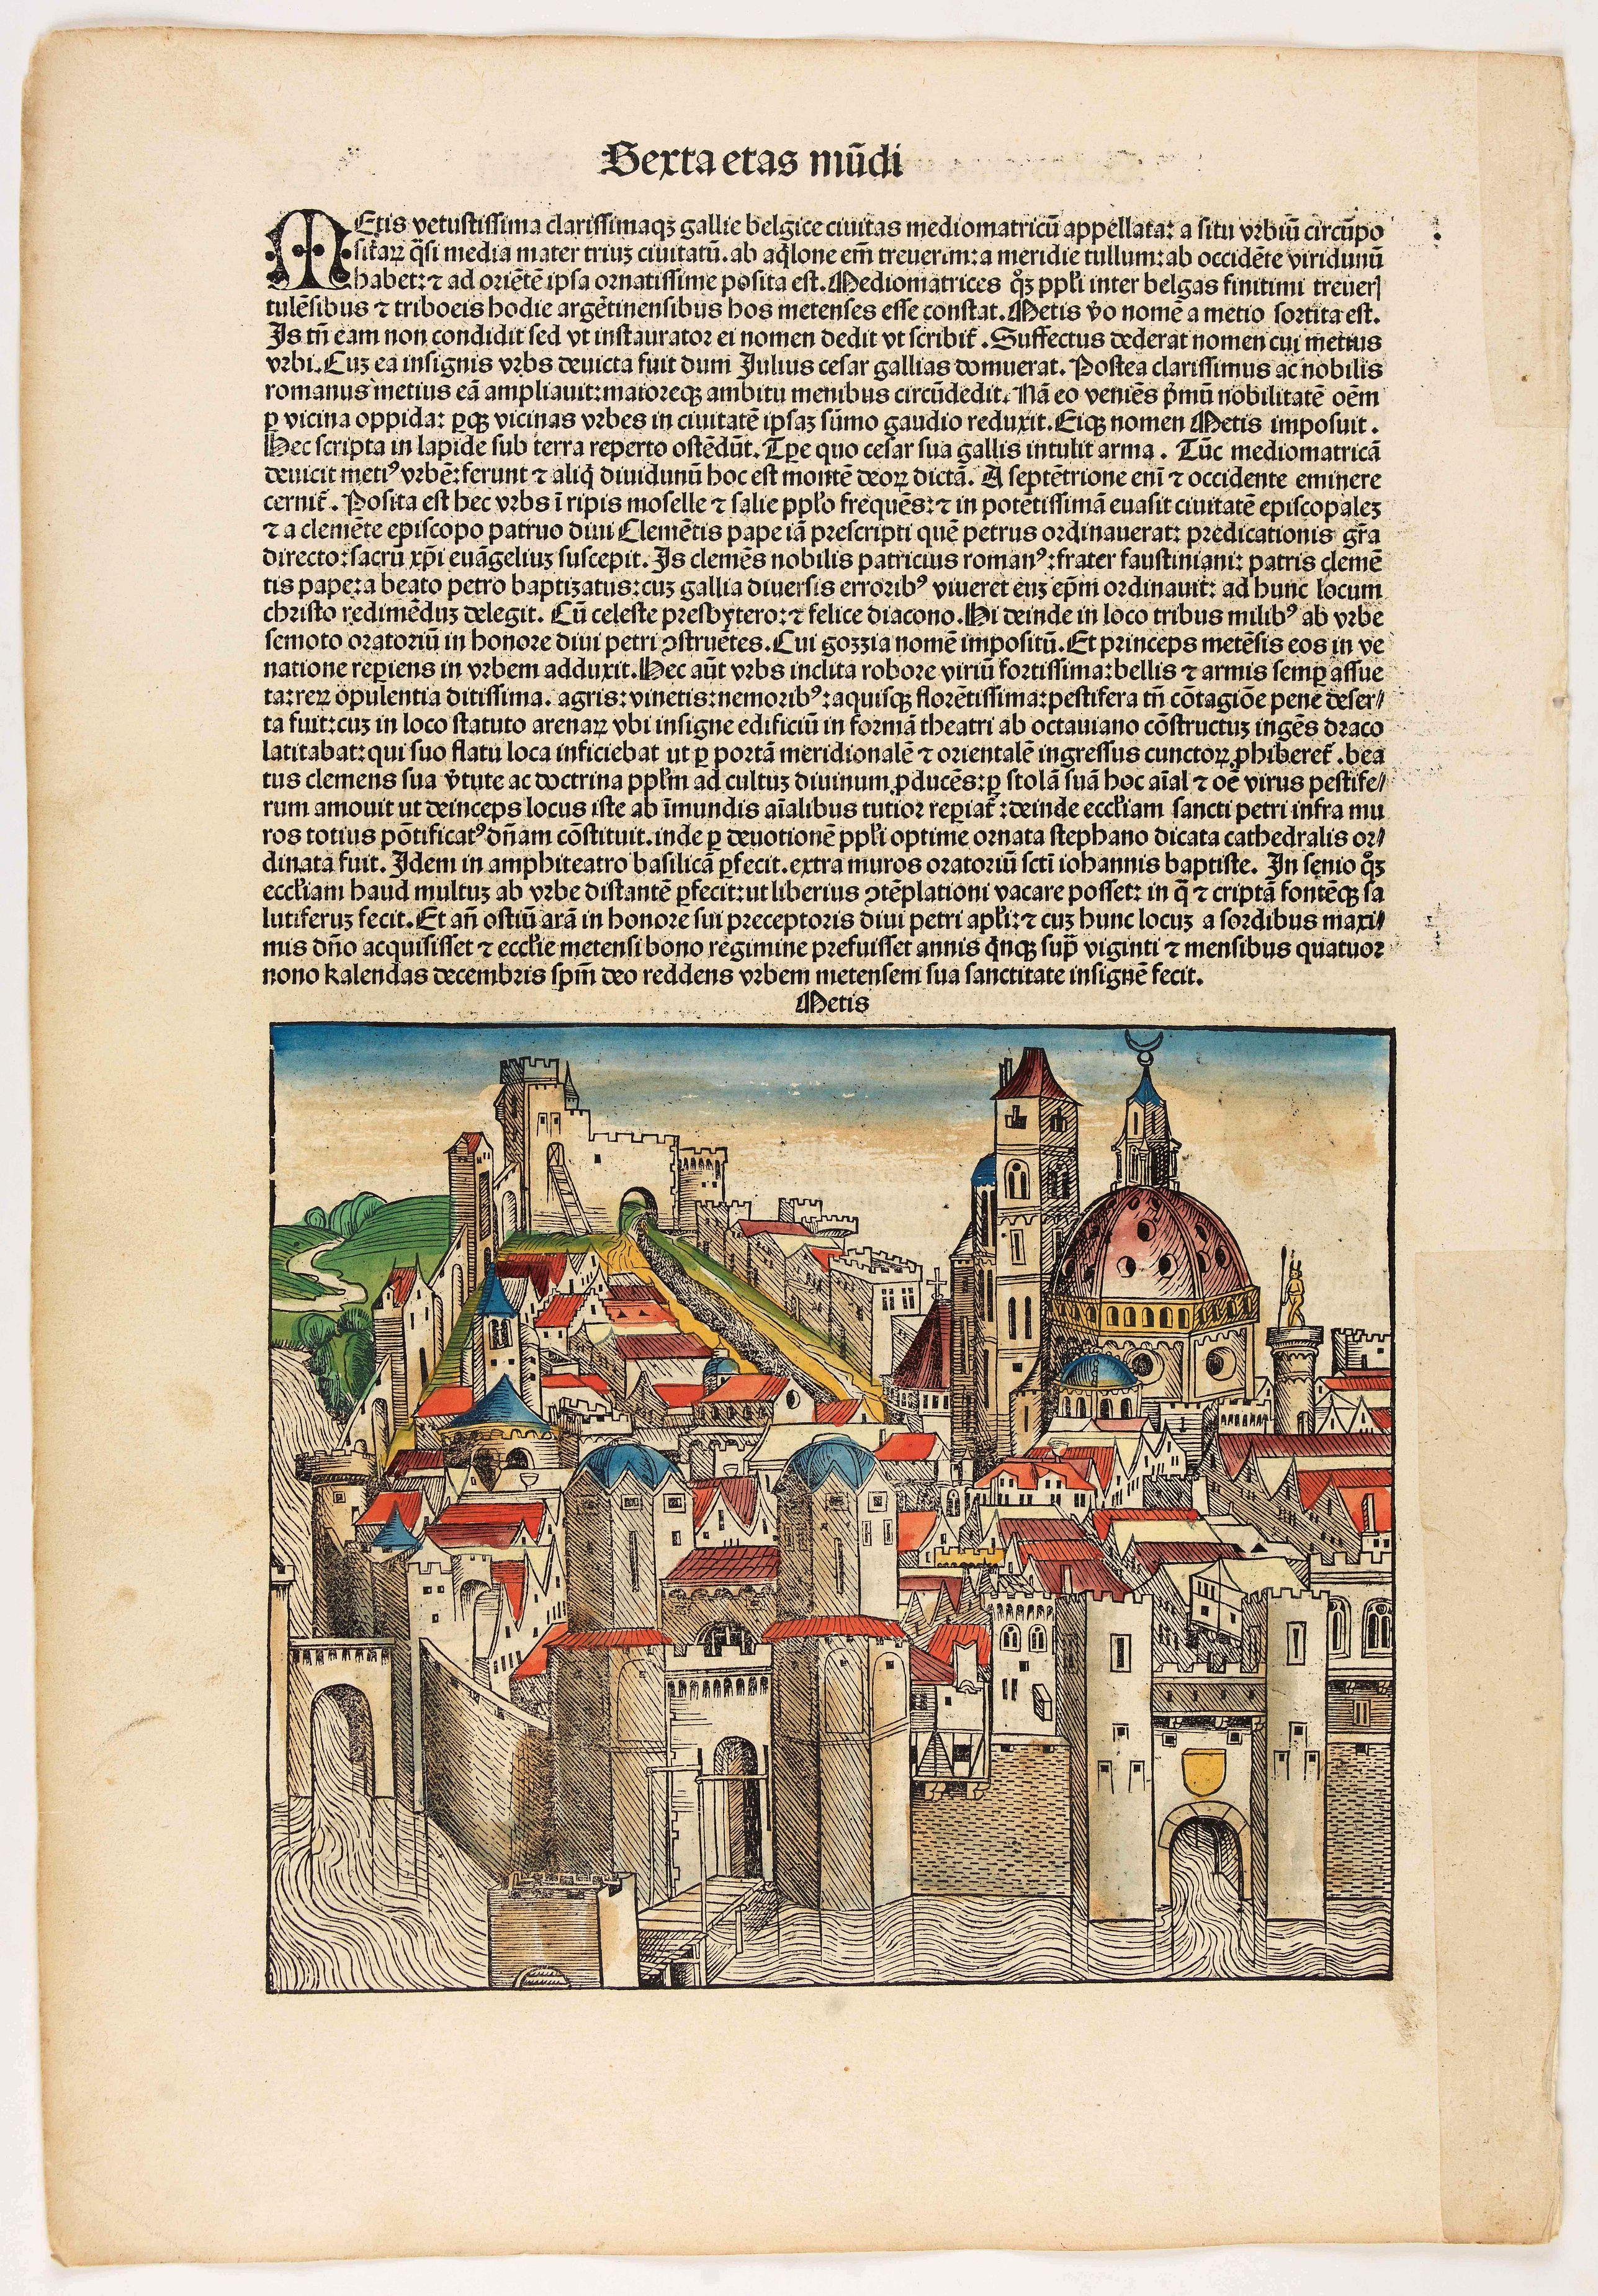 SCHEDEL, H. -  Terta Etas Mundi. Foliu CX